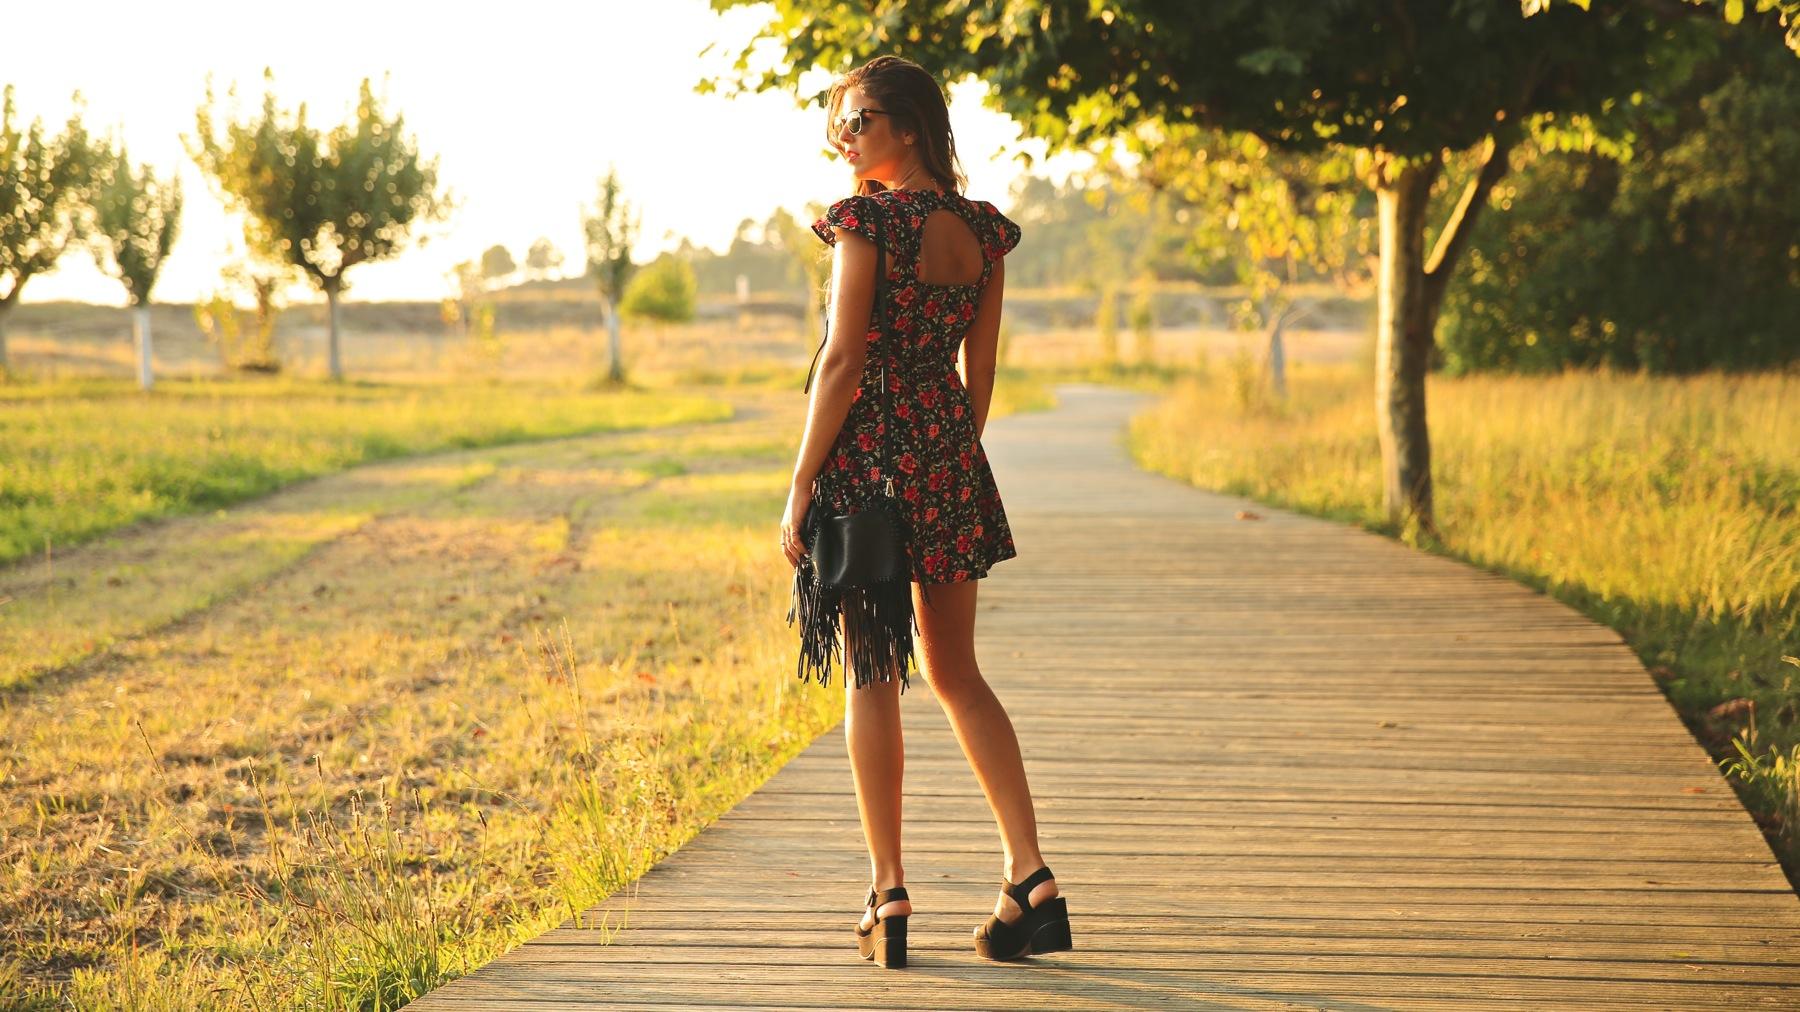 trendy_taste-look-outfit-street_style-ootd-blog-blogger-fashion_spain-moda_españa-flower_print-dress-vestido-flores-sandalias_negras-black_sandals-platforms-sunset-playa-beach-summer-11